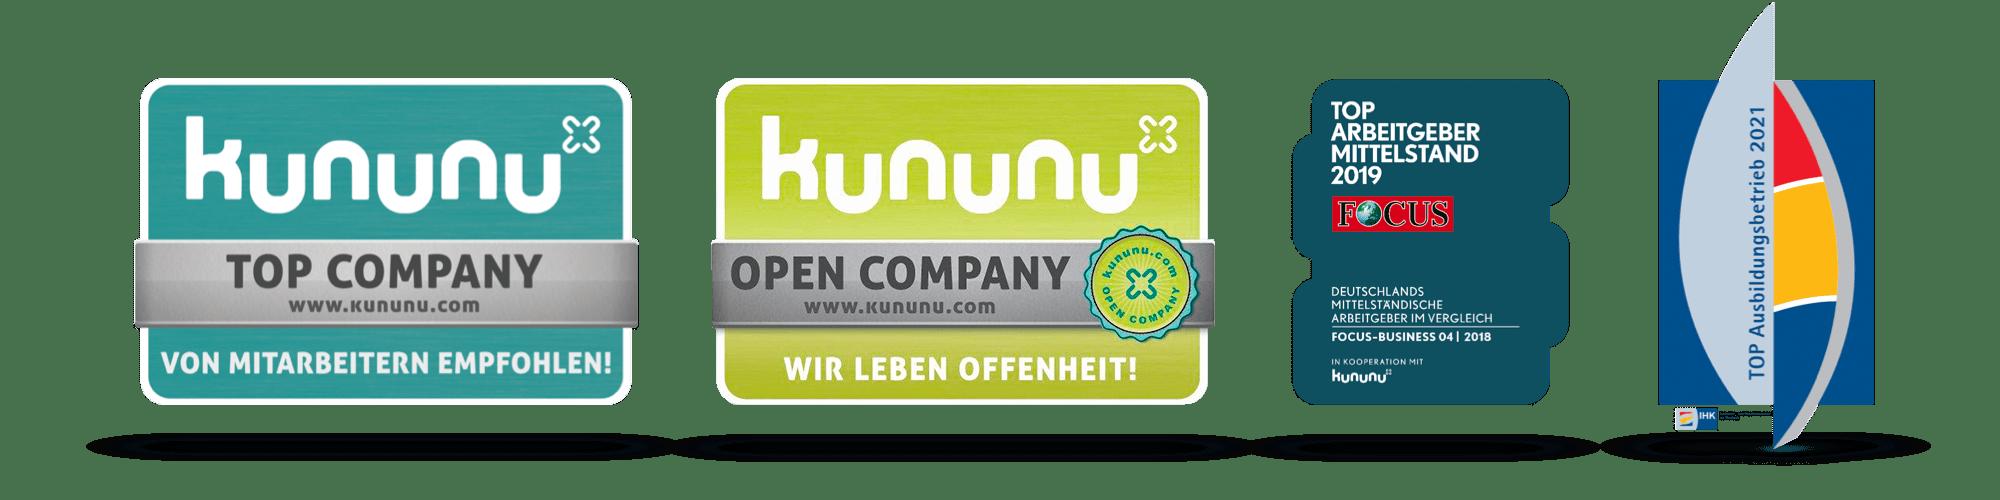 GECKO_Kununu_Focus_IHK_Top_Arbeitgeber_Small